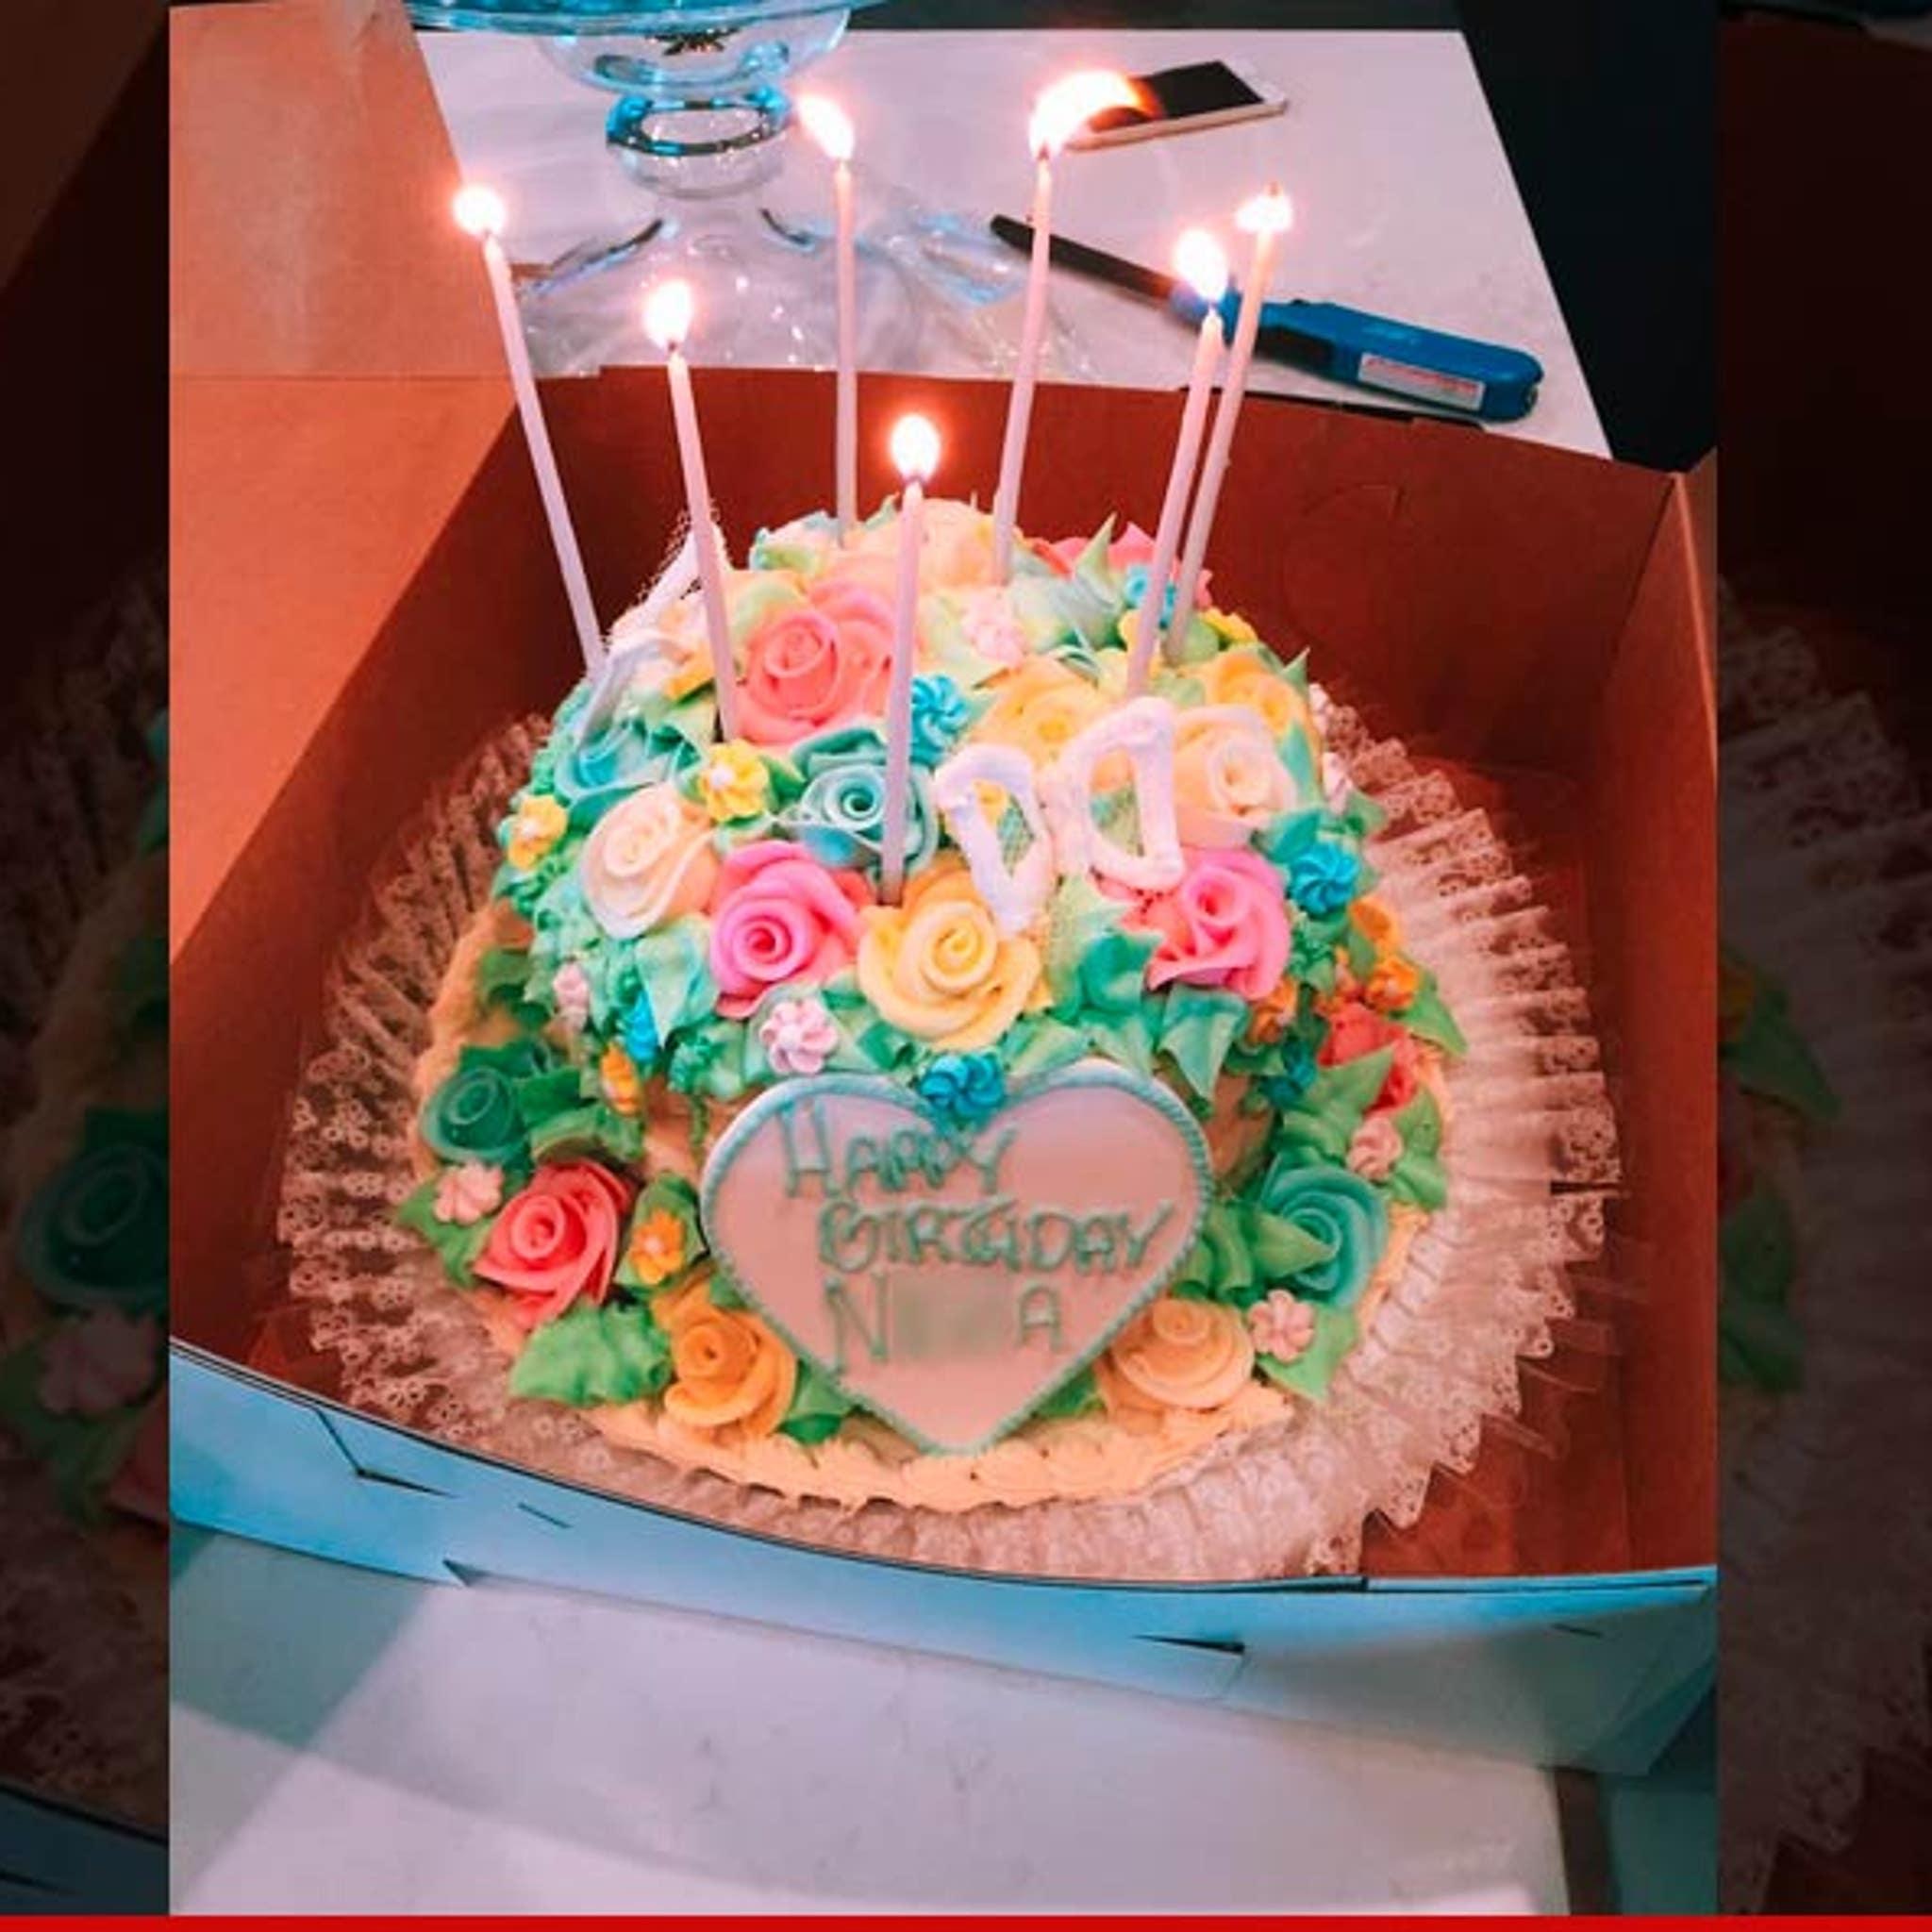 Marvelous Kylie Jenners Best Friend Happy Birthday N Funny Birthday Cards Online Chimdamsfinfo